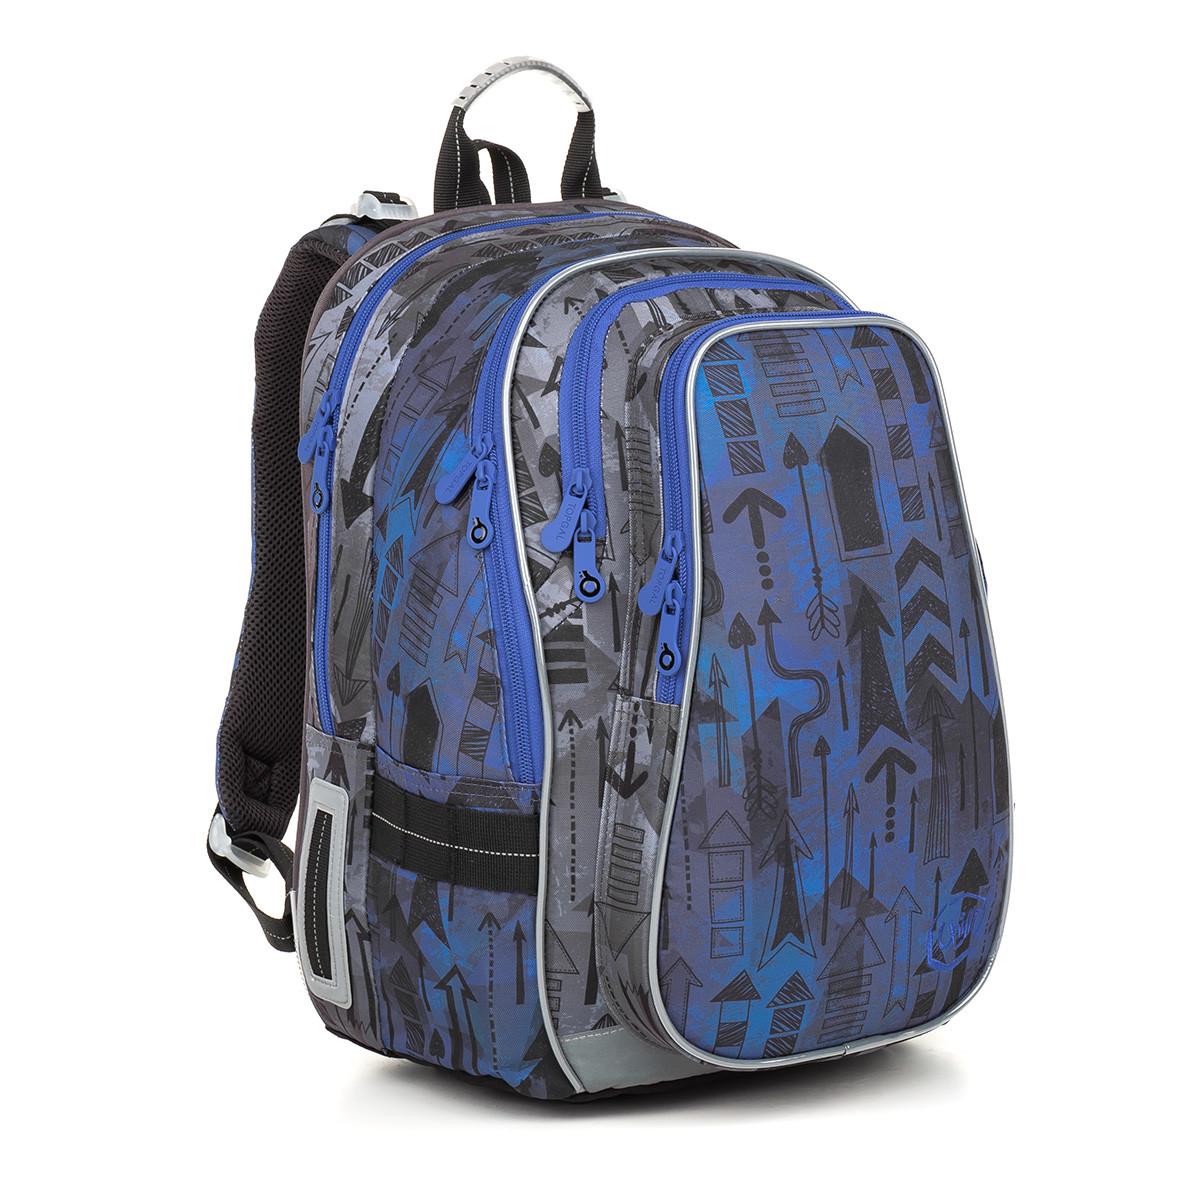 136d3929517 Školní batoh Topgal - LYNN 18005 B